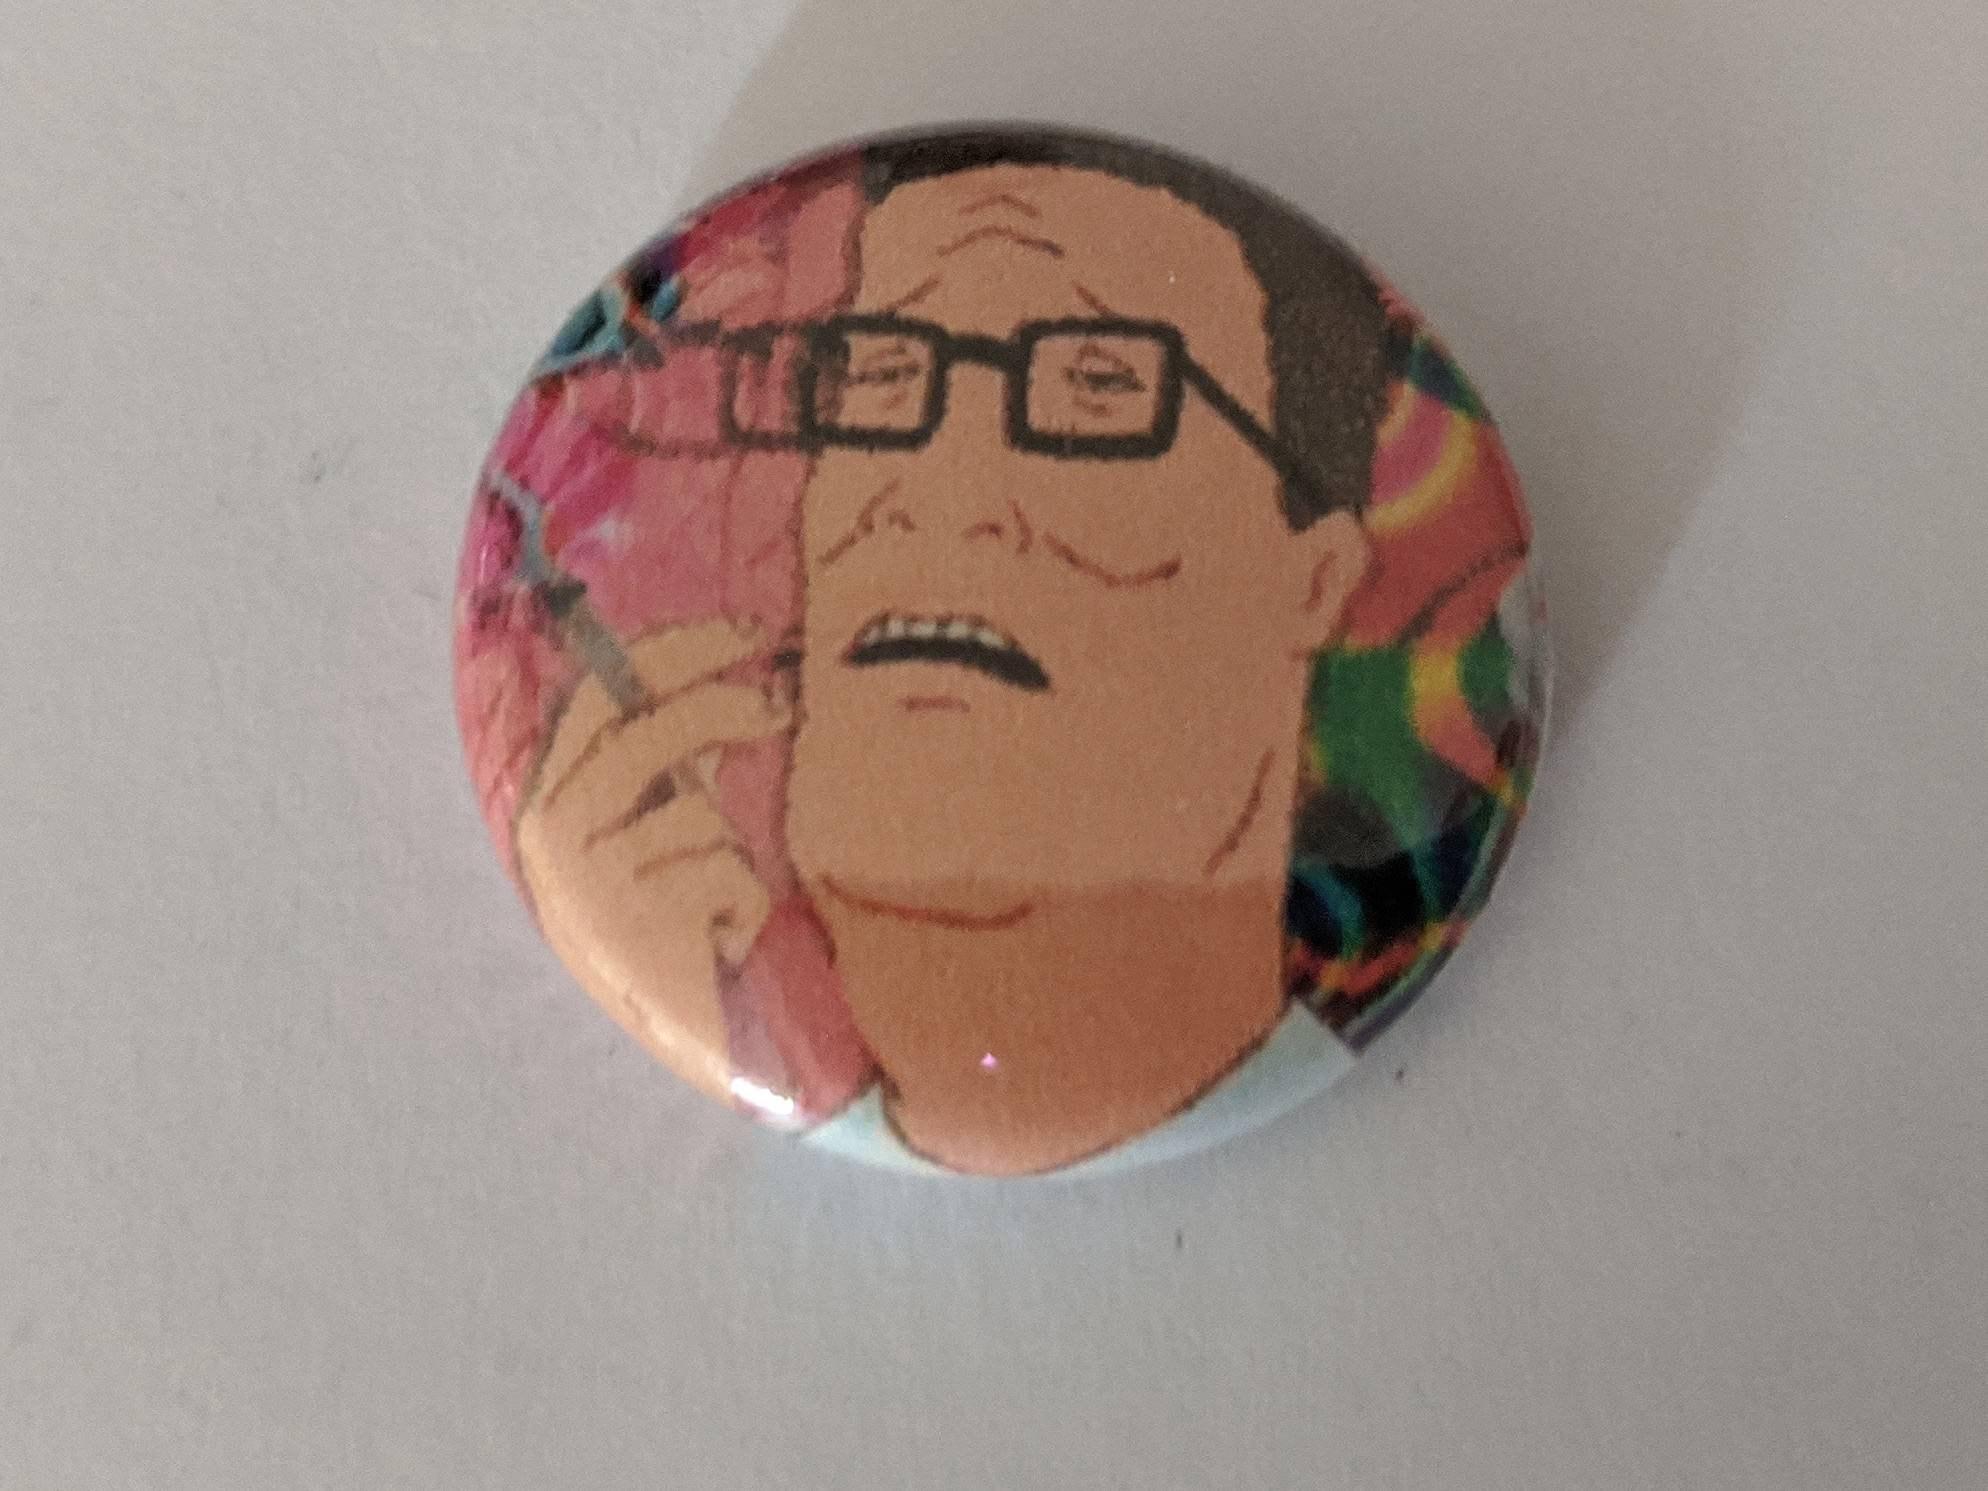 1 Hank Hill 420 Pinback Meme Button